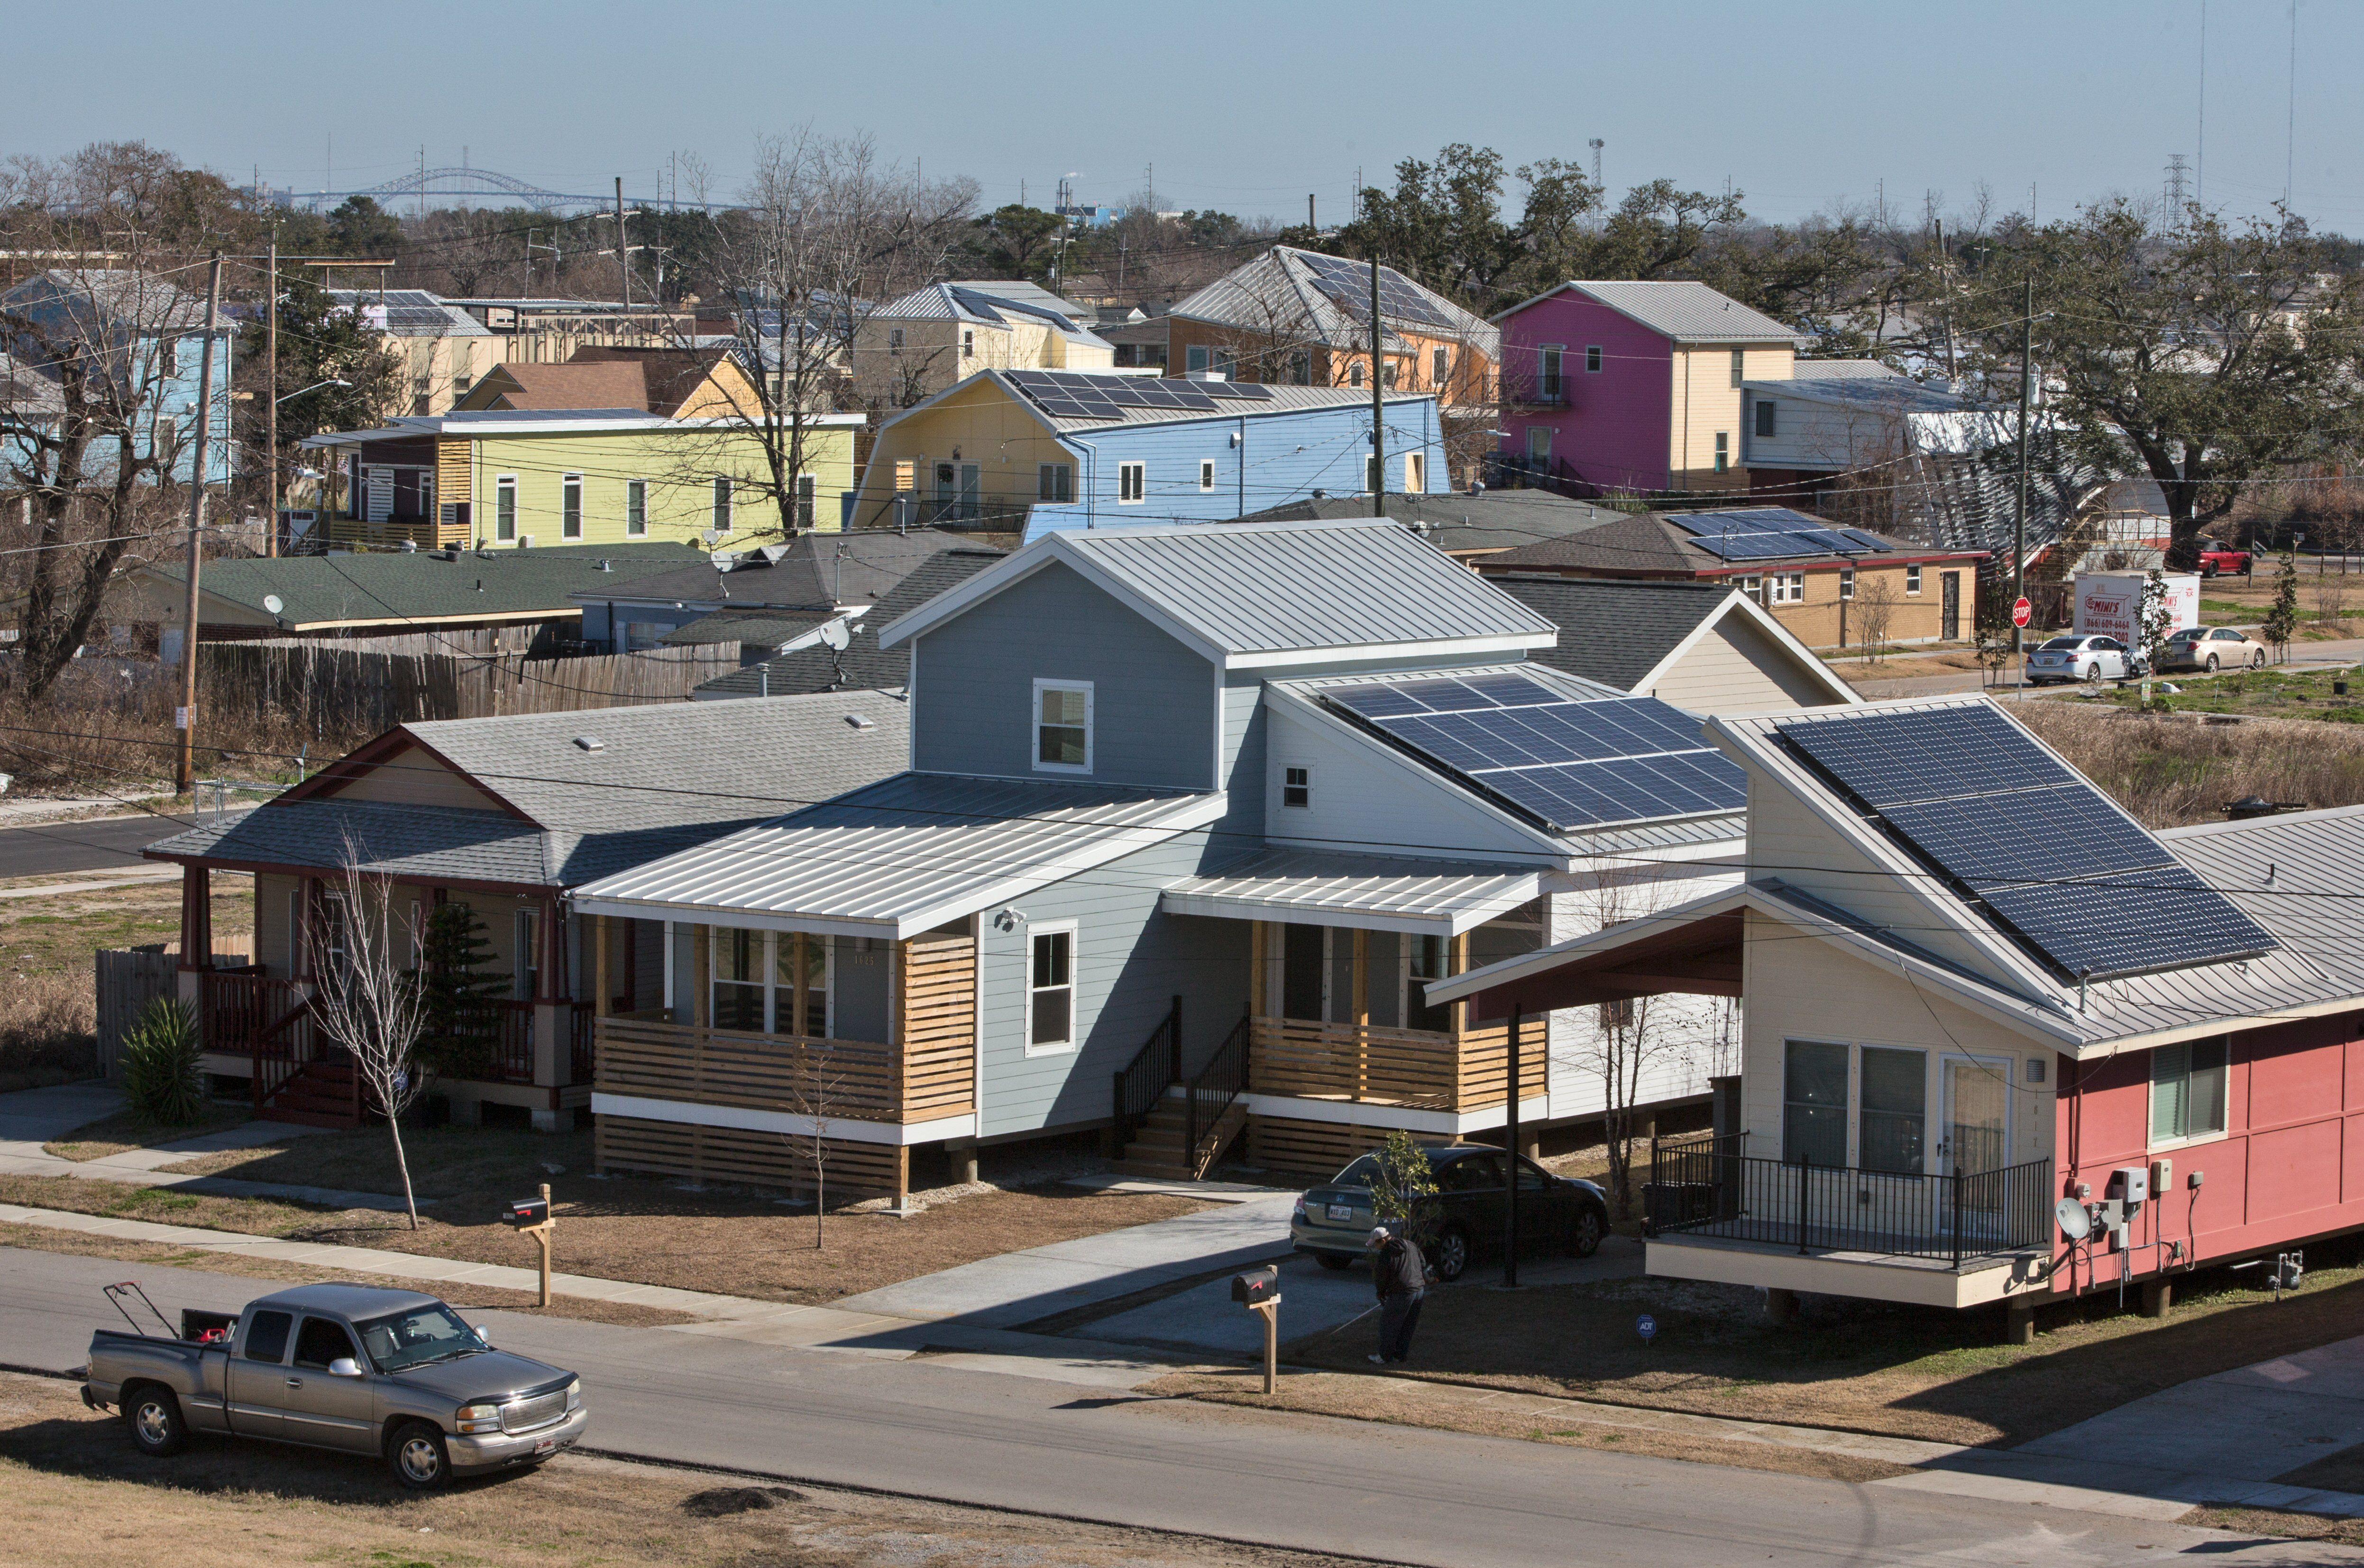 neighborhood of low-built, prefabricated homes